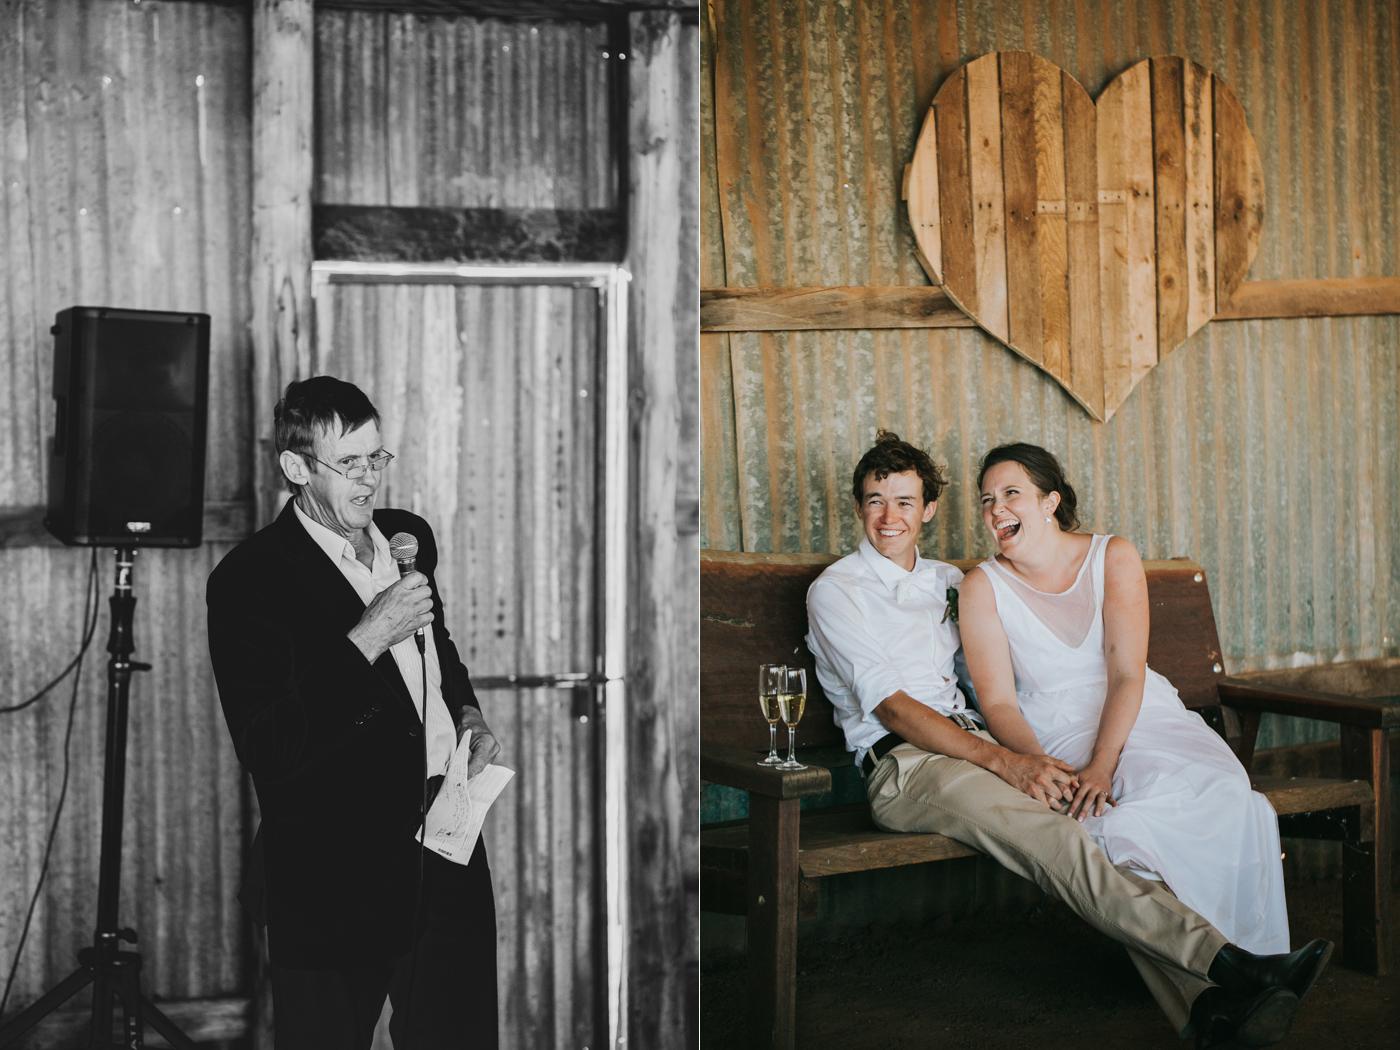 Nicolle & Jacob - Dubbo Wedding - Country Australia - Samantha Heather Photography-233.jpg